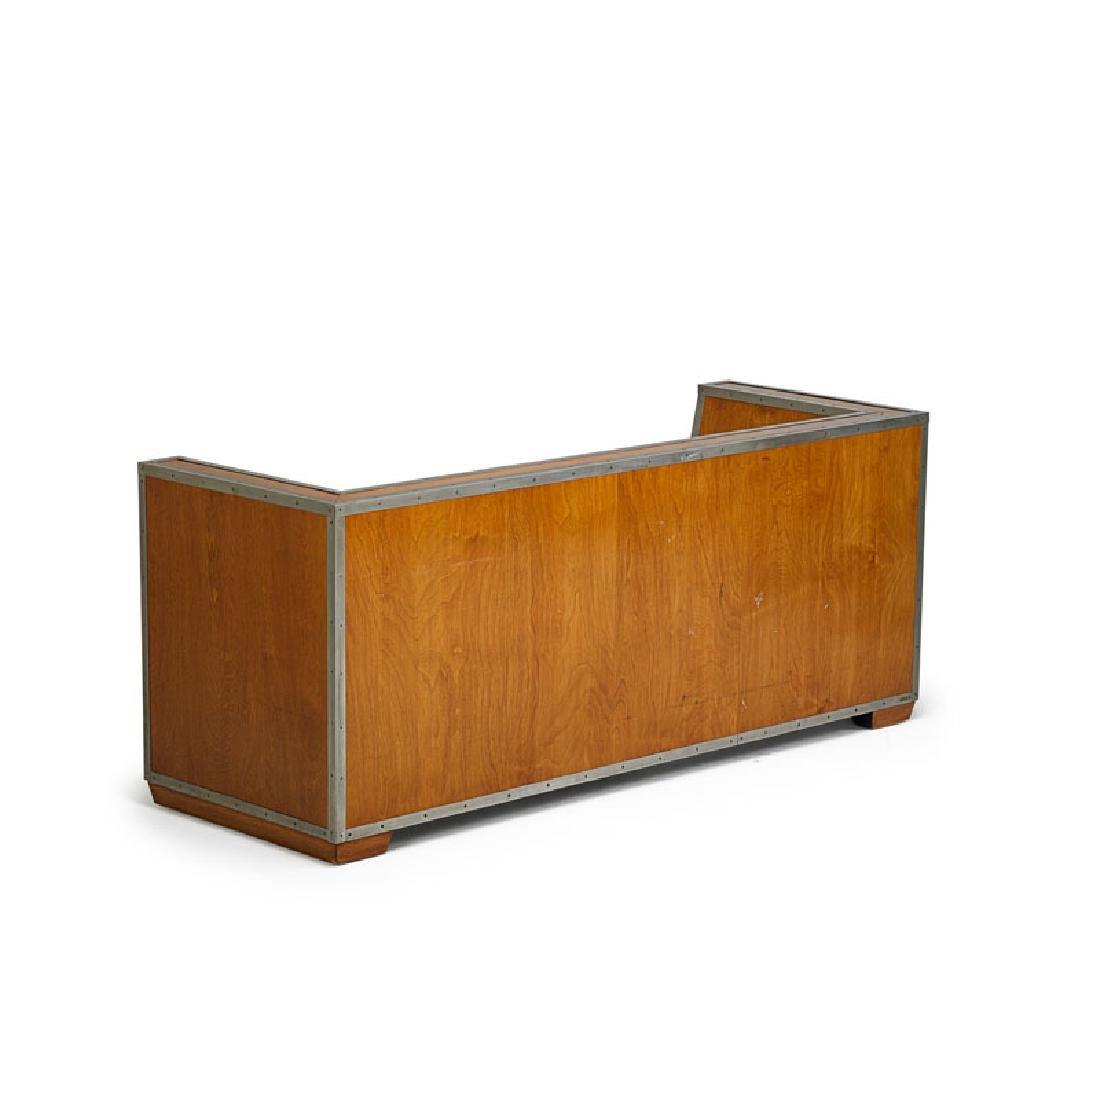 PAUL FRANKL Art Deco sofa - 3